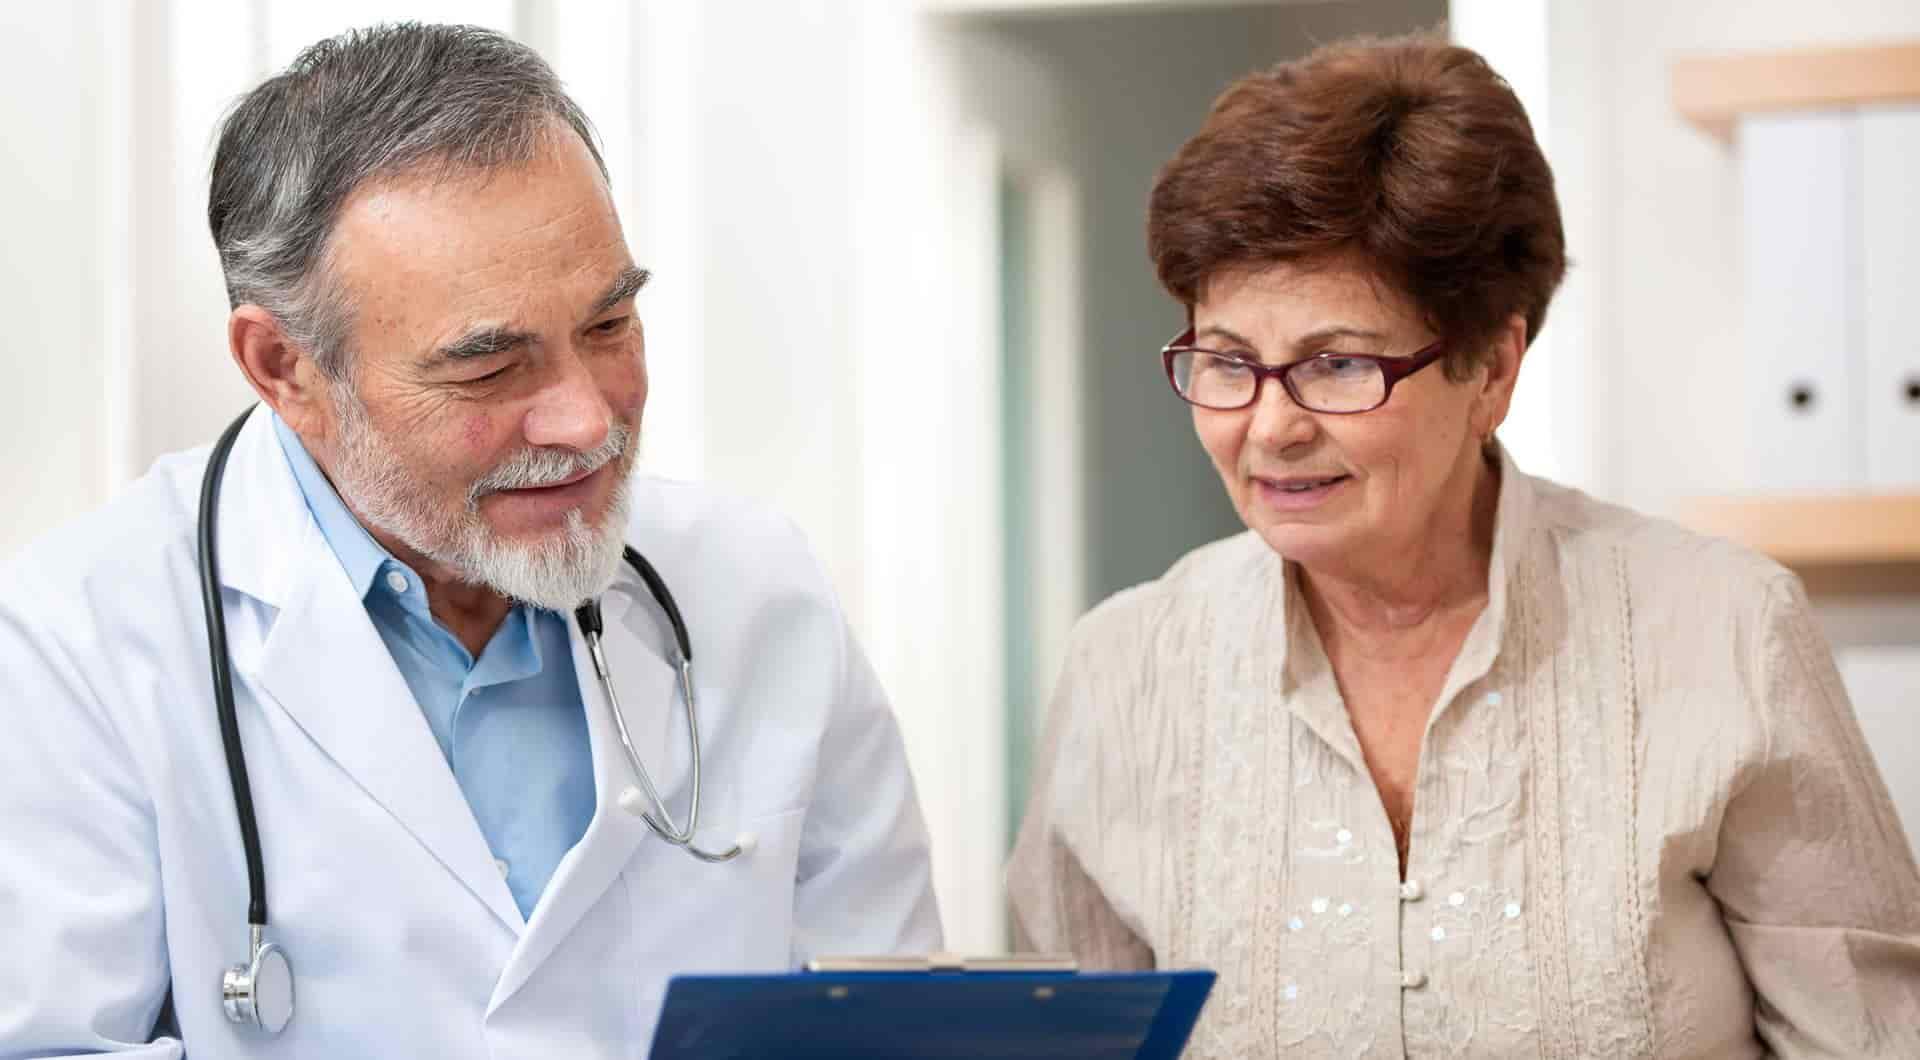 1-Clinicas-de-Reabilitacao-para-Dependentes-Quimicos-linica-recuperando-vida-3